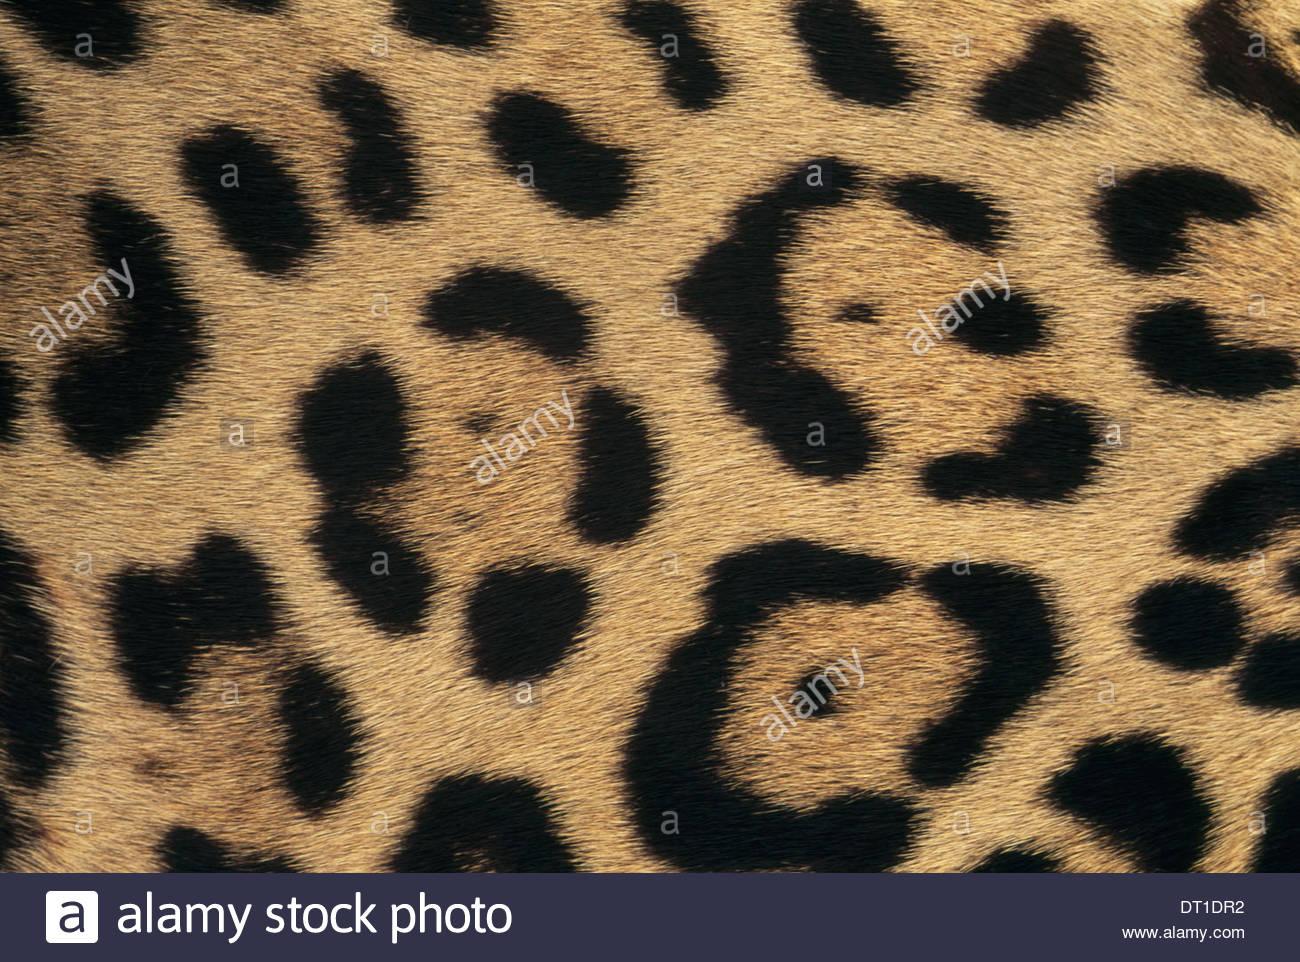 Belize Jaguar skin pattern Pantheronca Belize - Stock Image